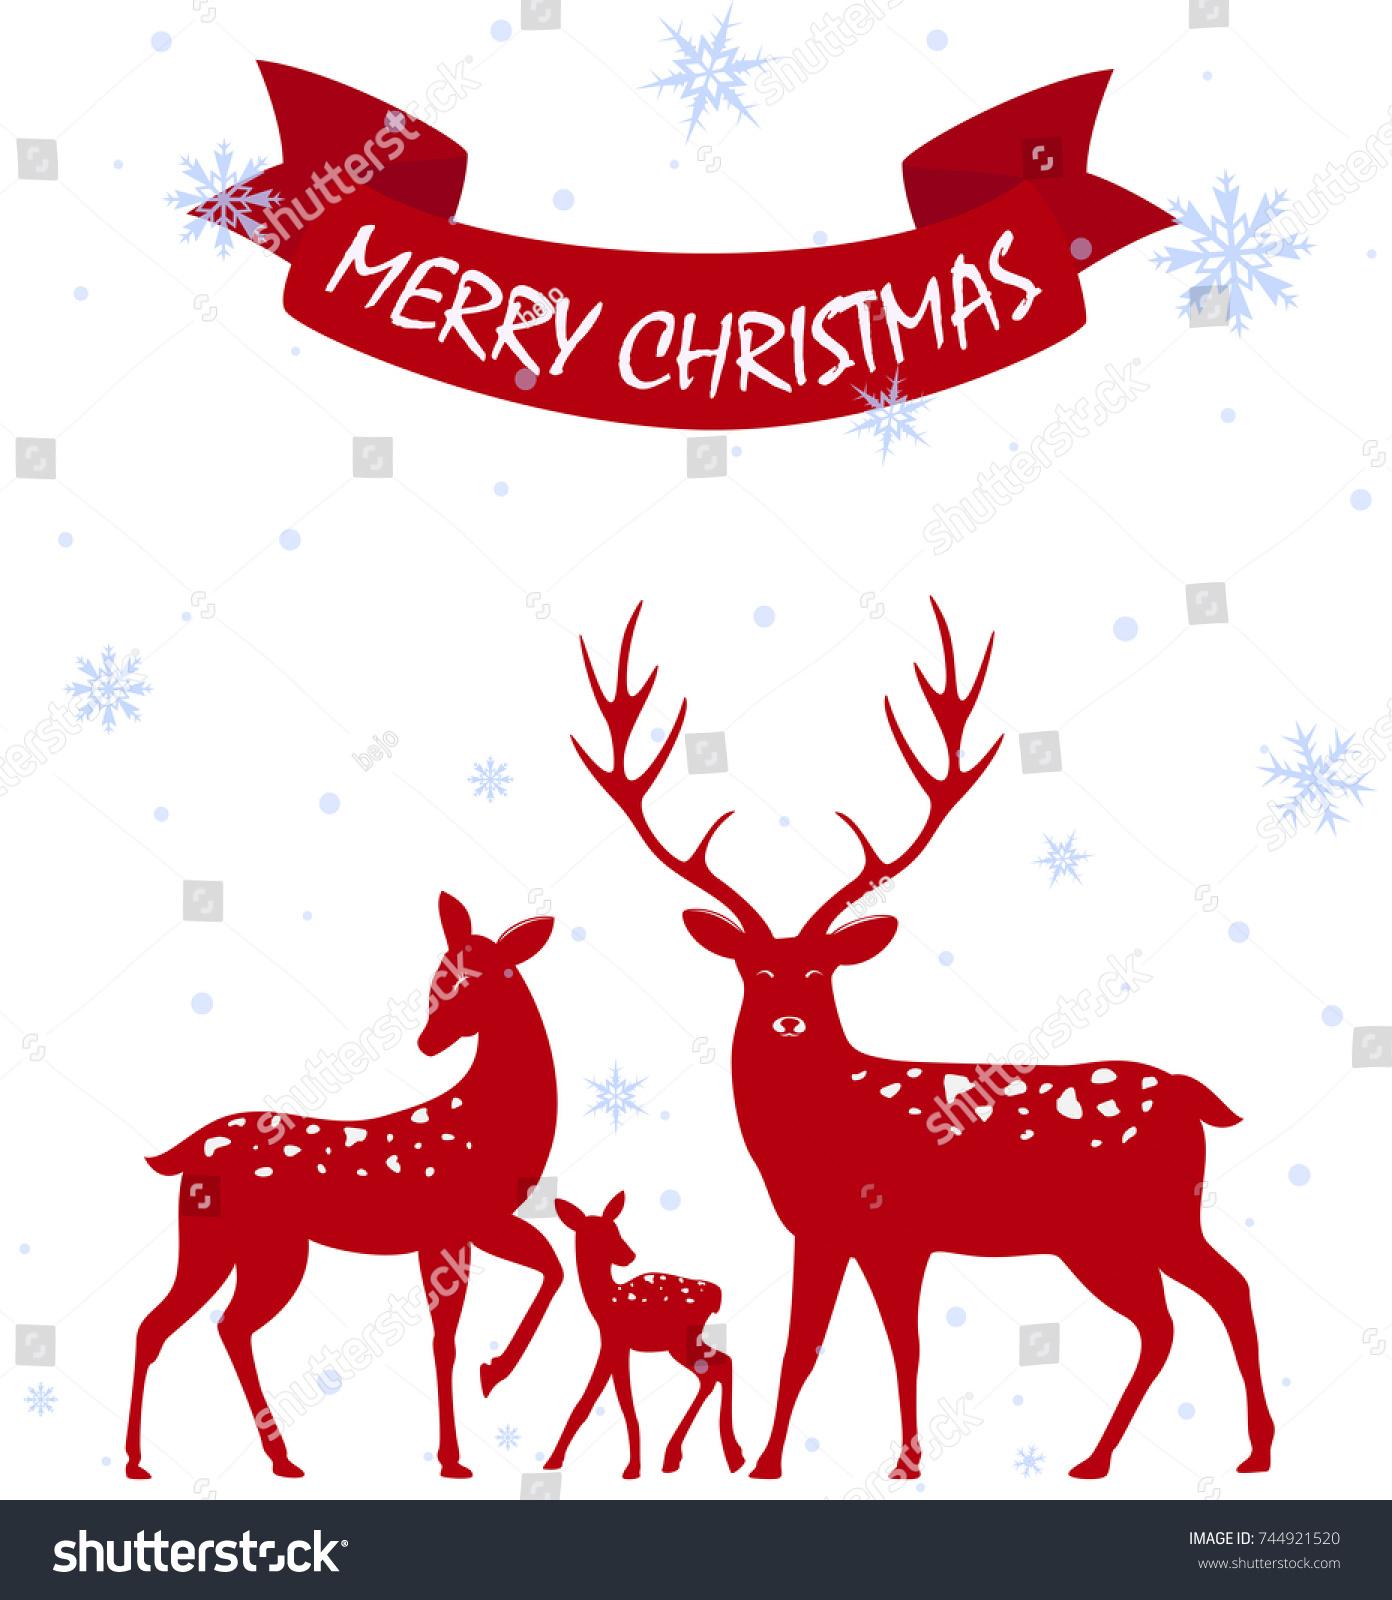 Merry Christmas Deer Family Greeting Card Stock Vector 744921520